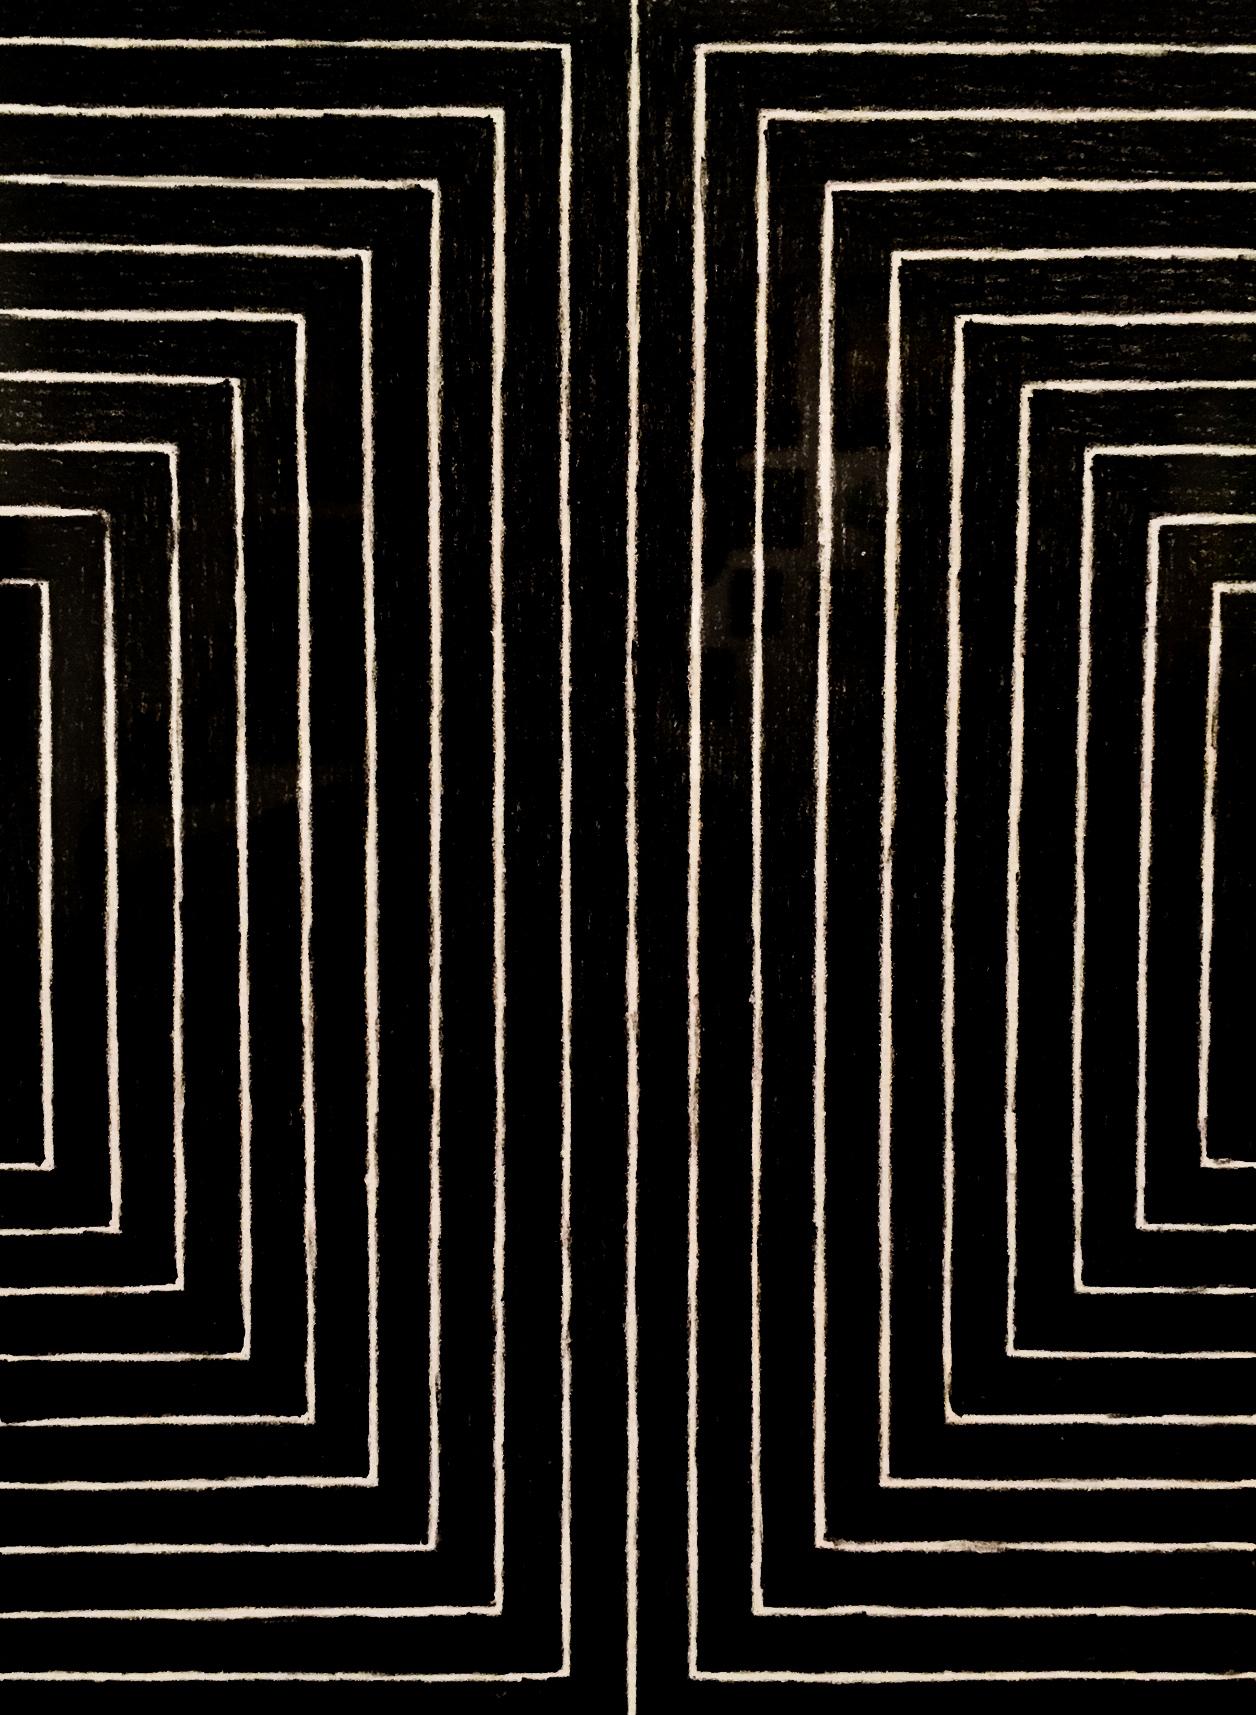 Frank Stella, from Black Series I